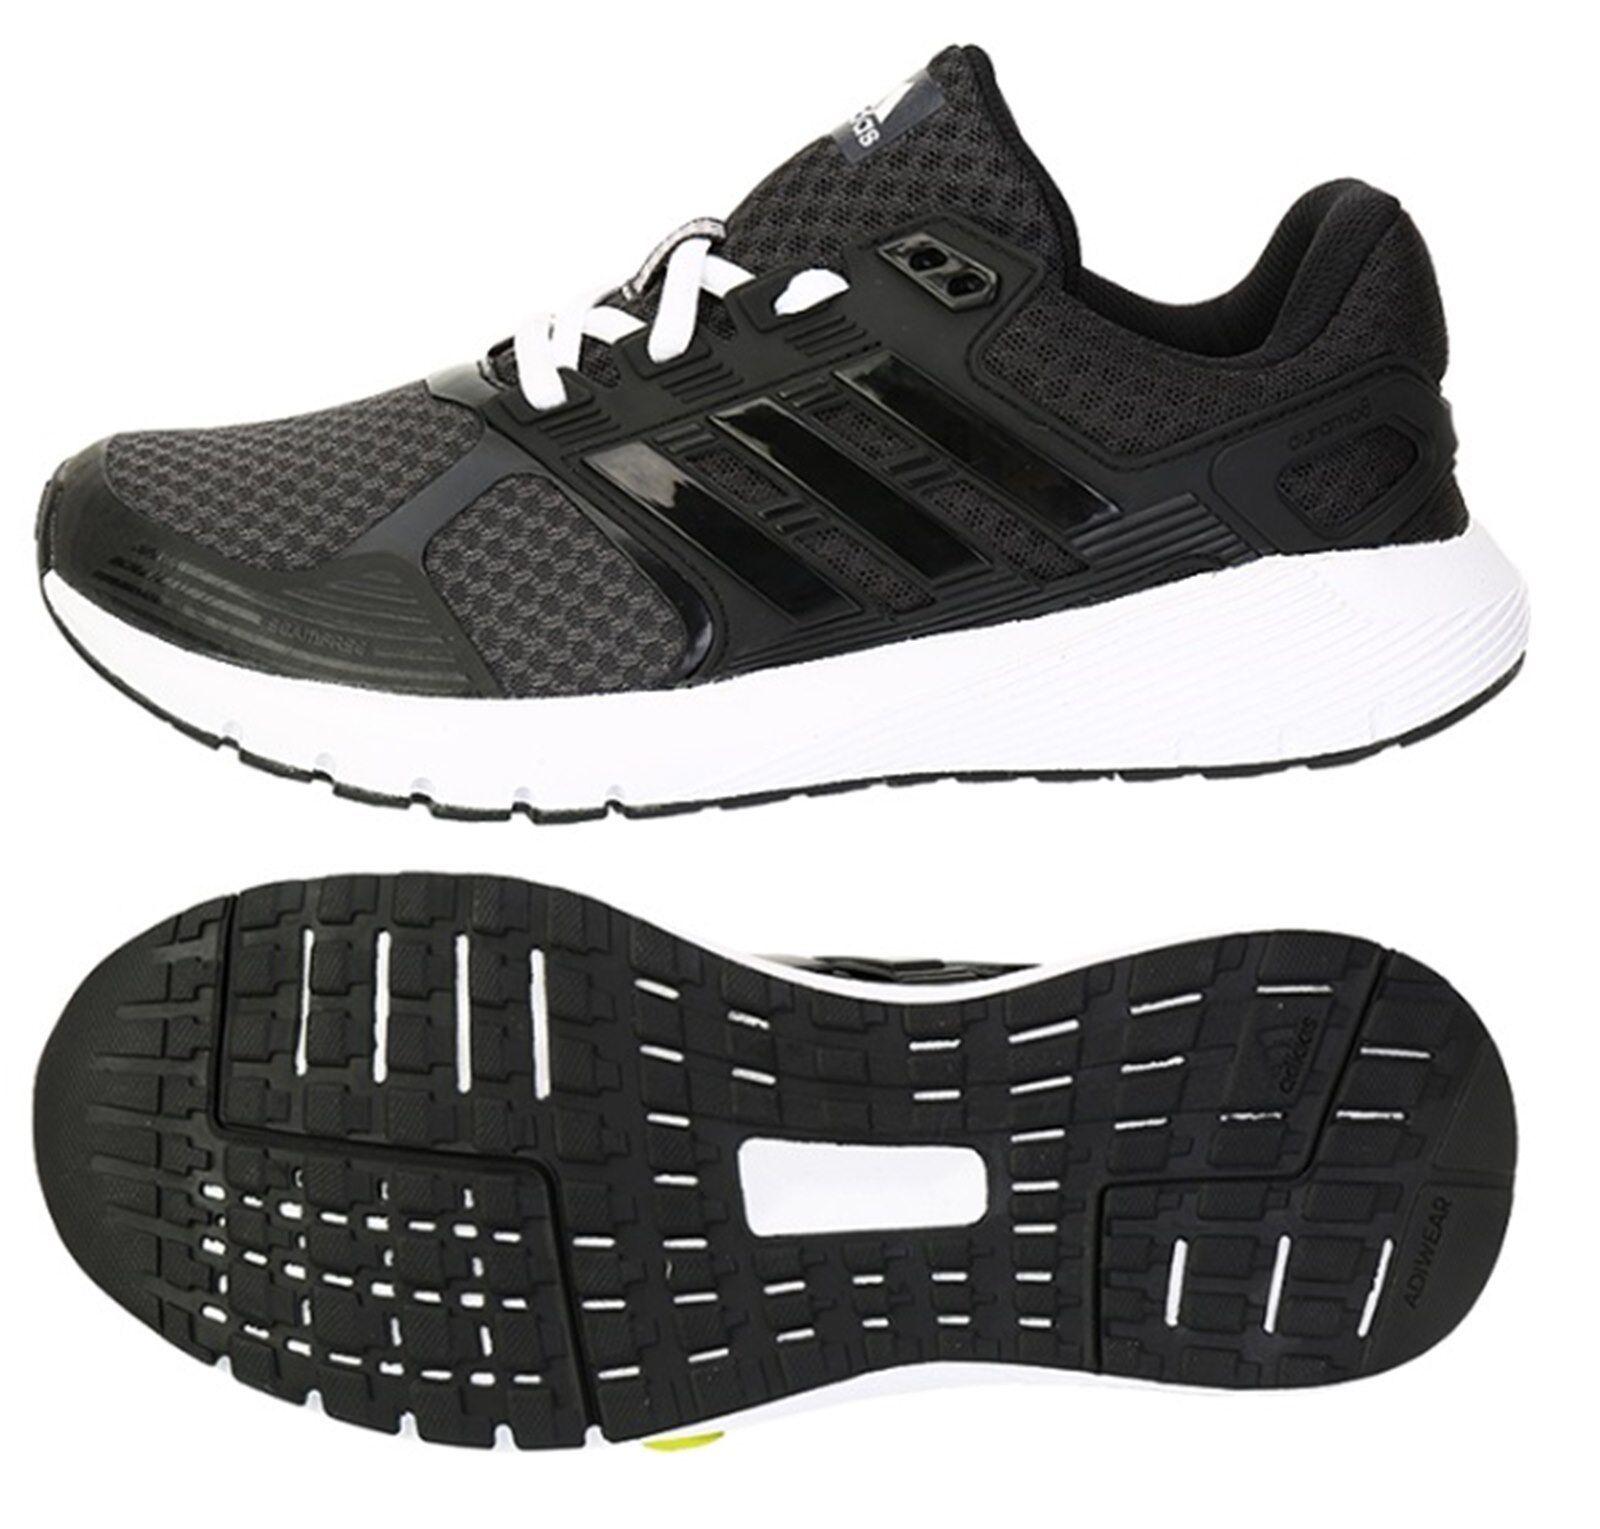 Adidas Vrouwen DURAMO 8 Training schoenen hardlopen zwart Atletic sportschoenen BA8086